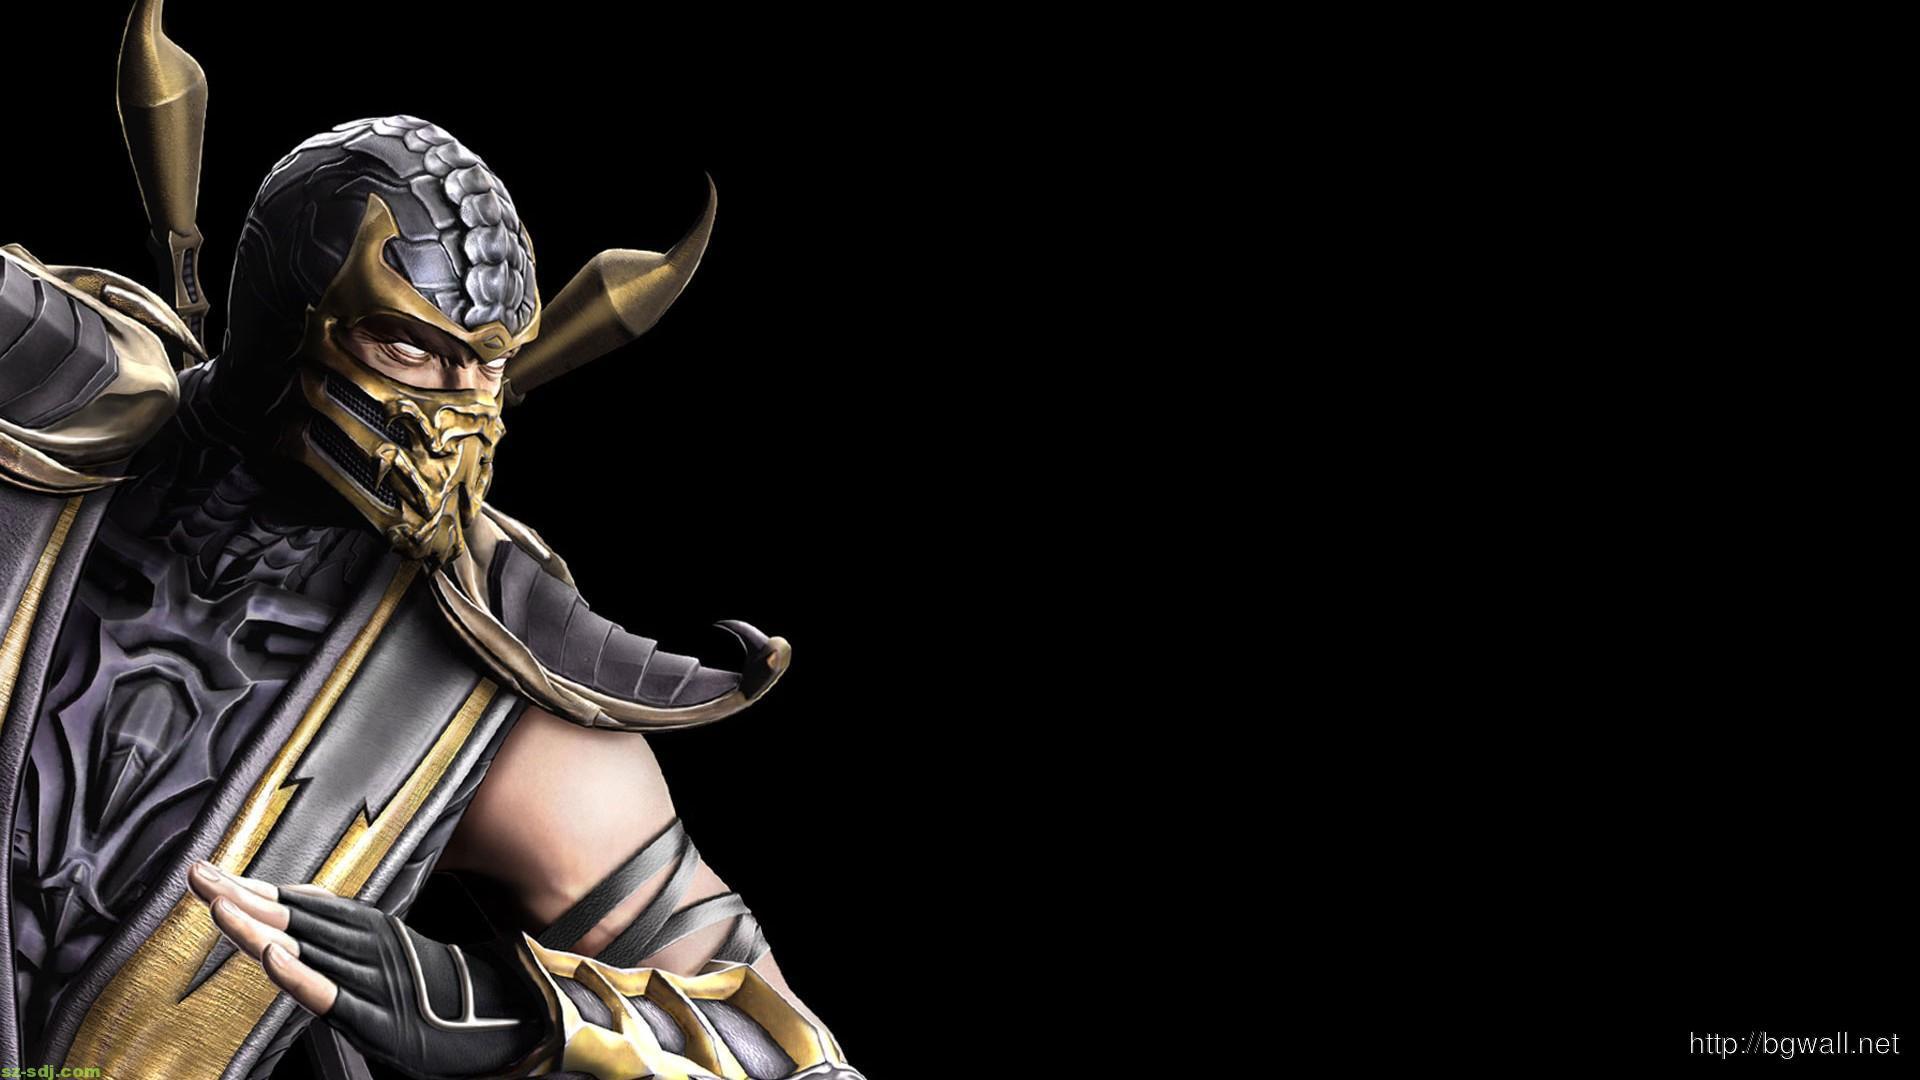 Cool Scorpion Mortal Kombal Wallpaper Hd Background